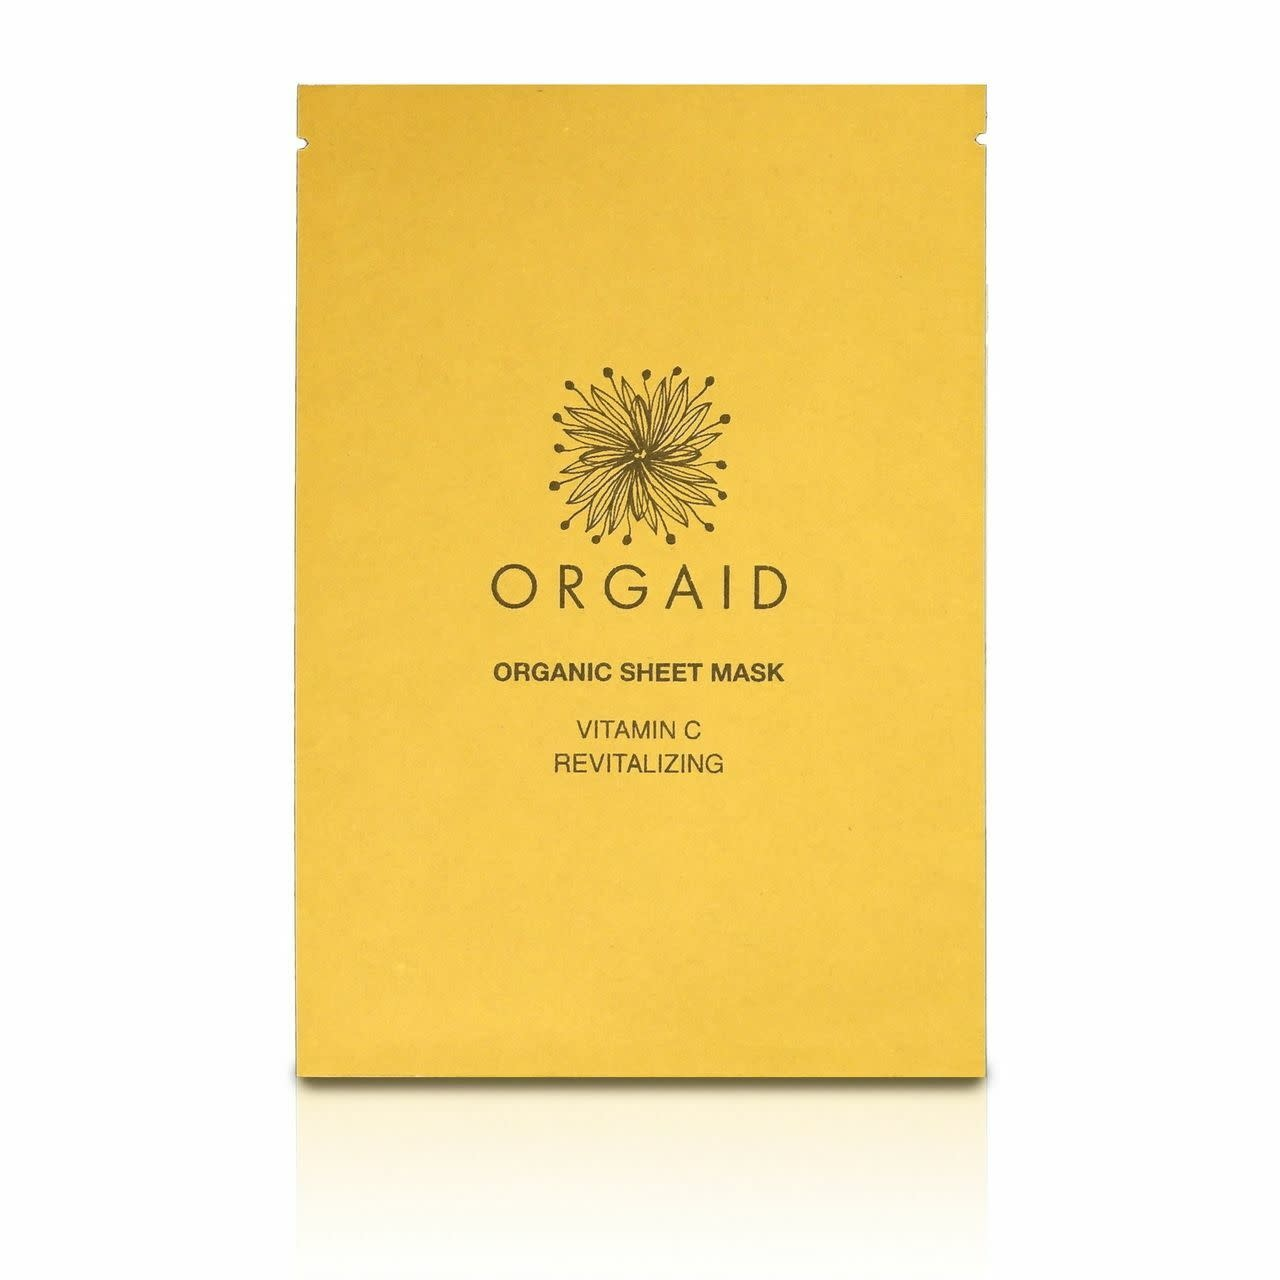 Vitamin C & Revitalizing Organic Sheet Mask-1